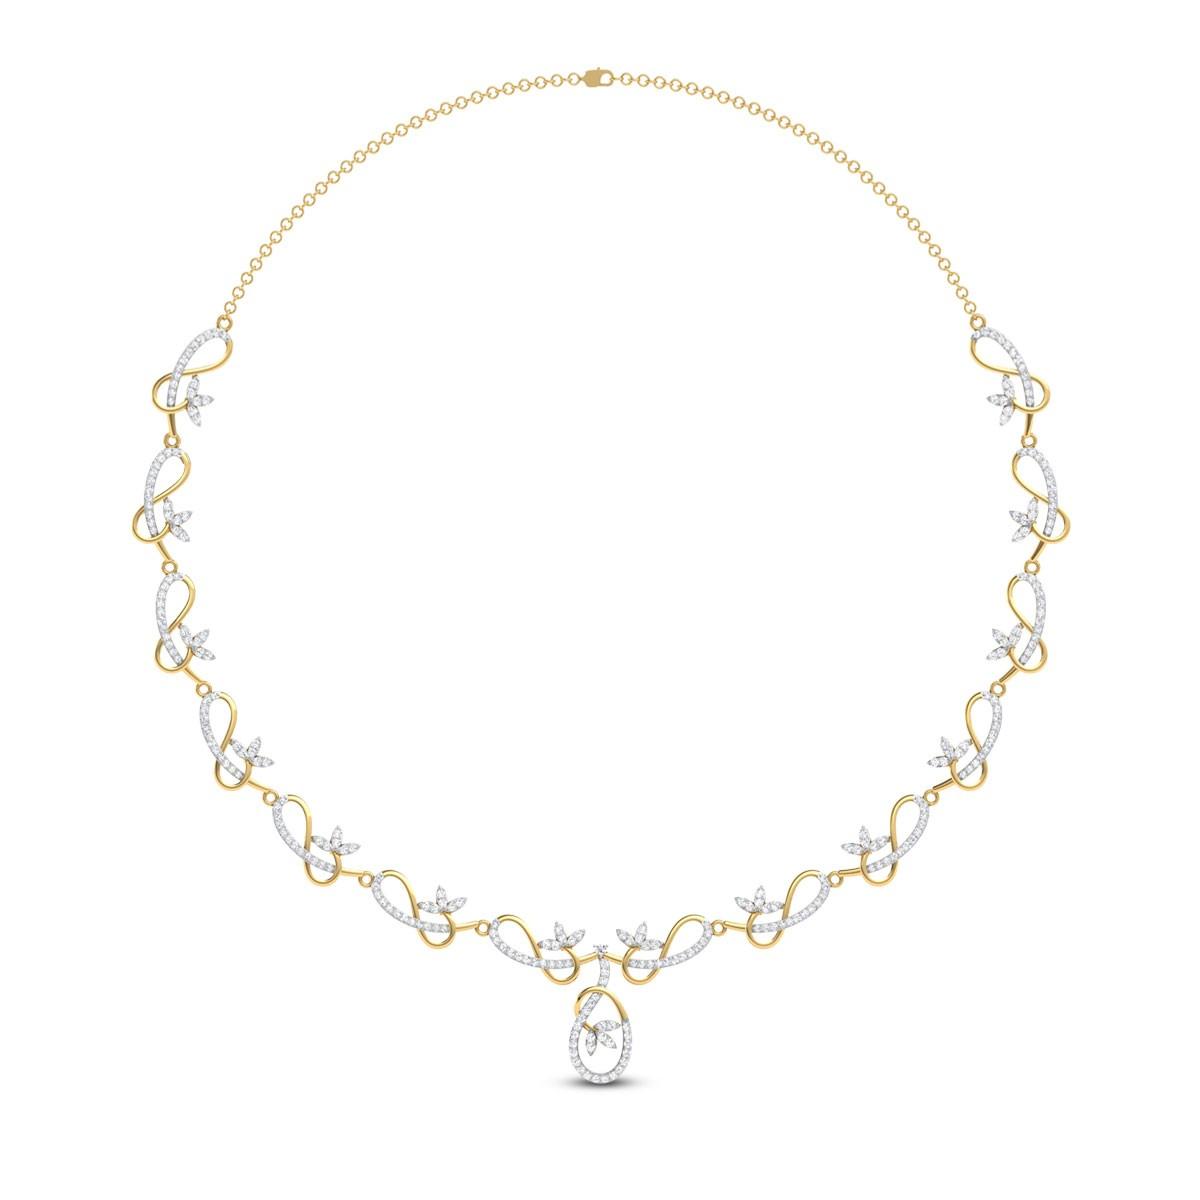 Shibhya Diamond Necklace